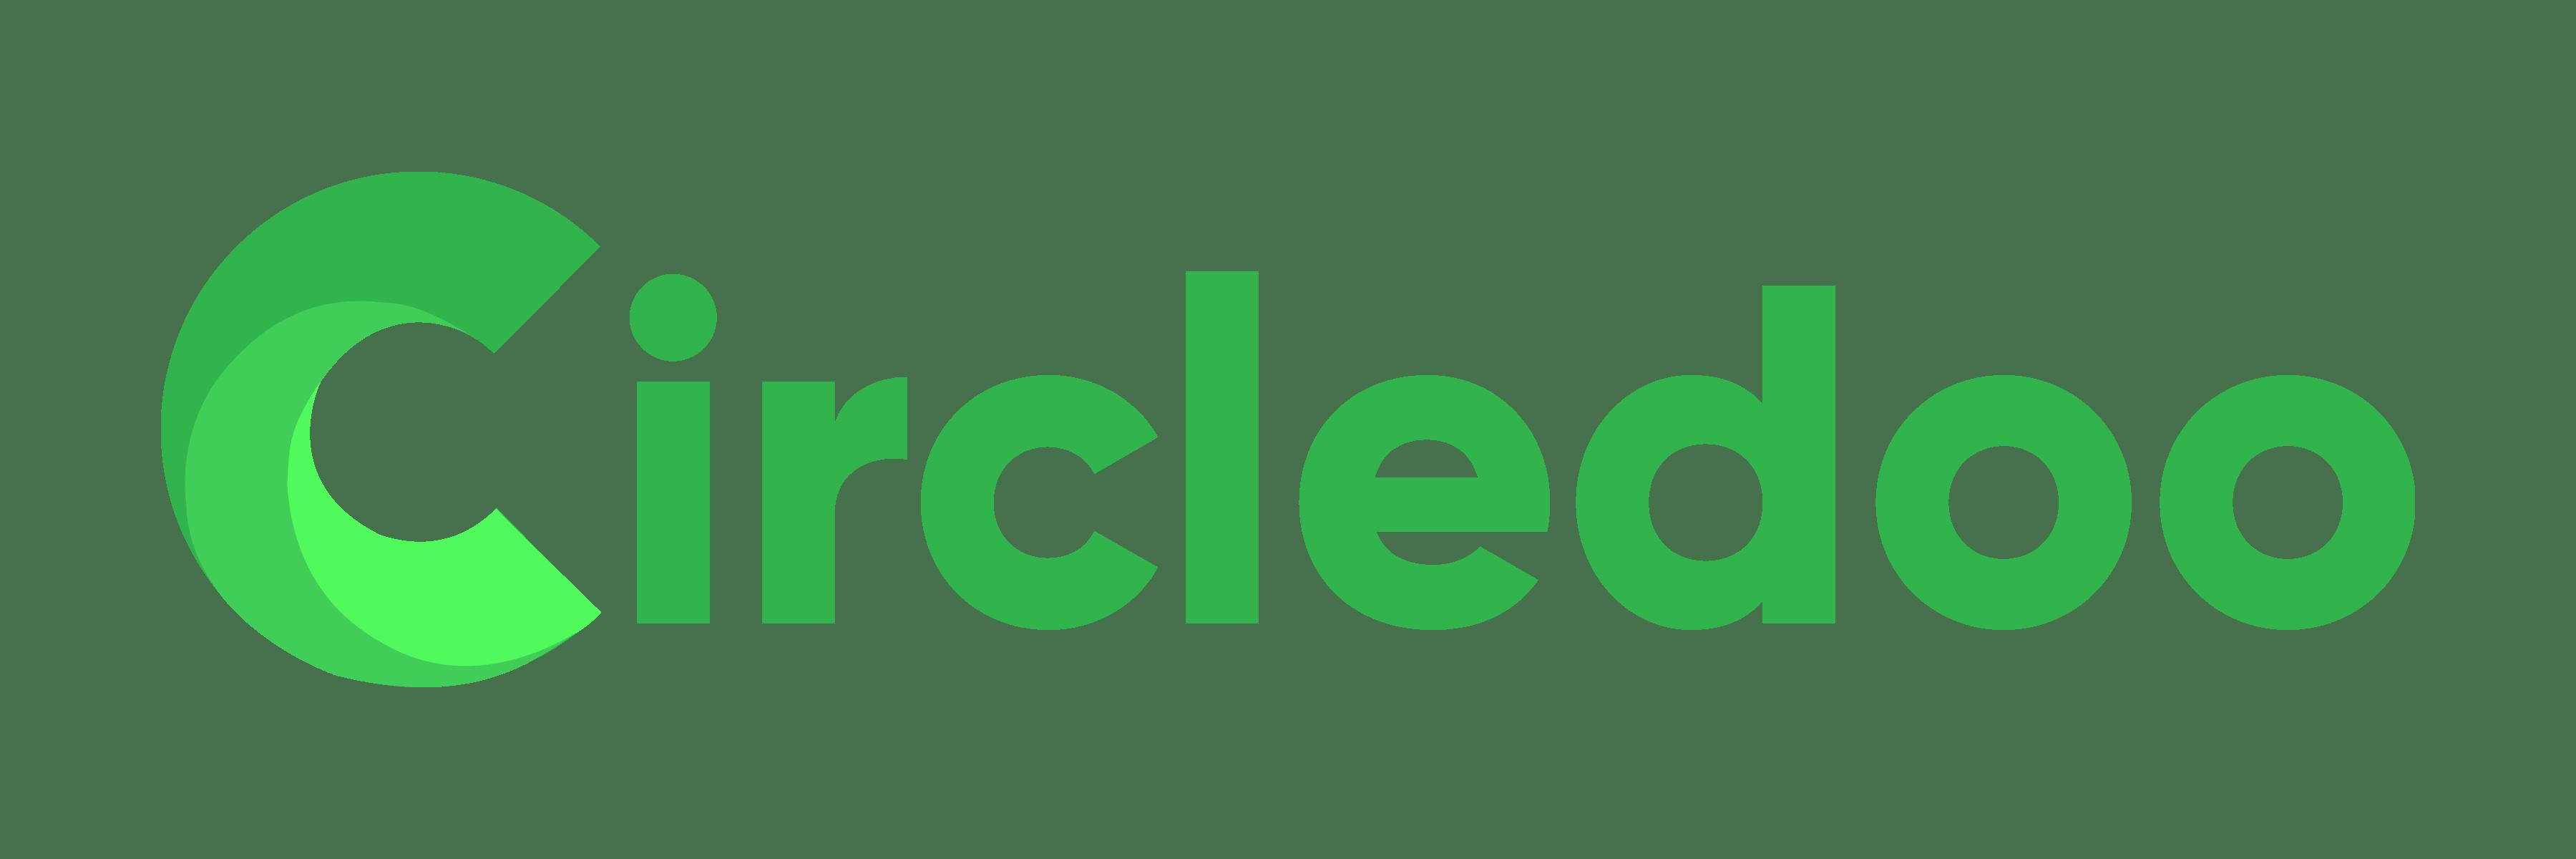 Circledu company logo